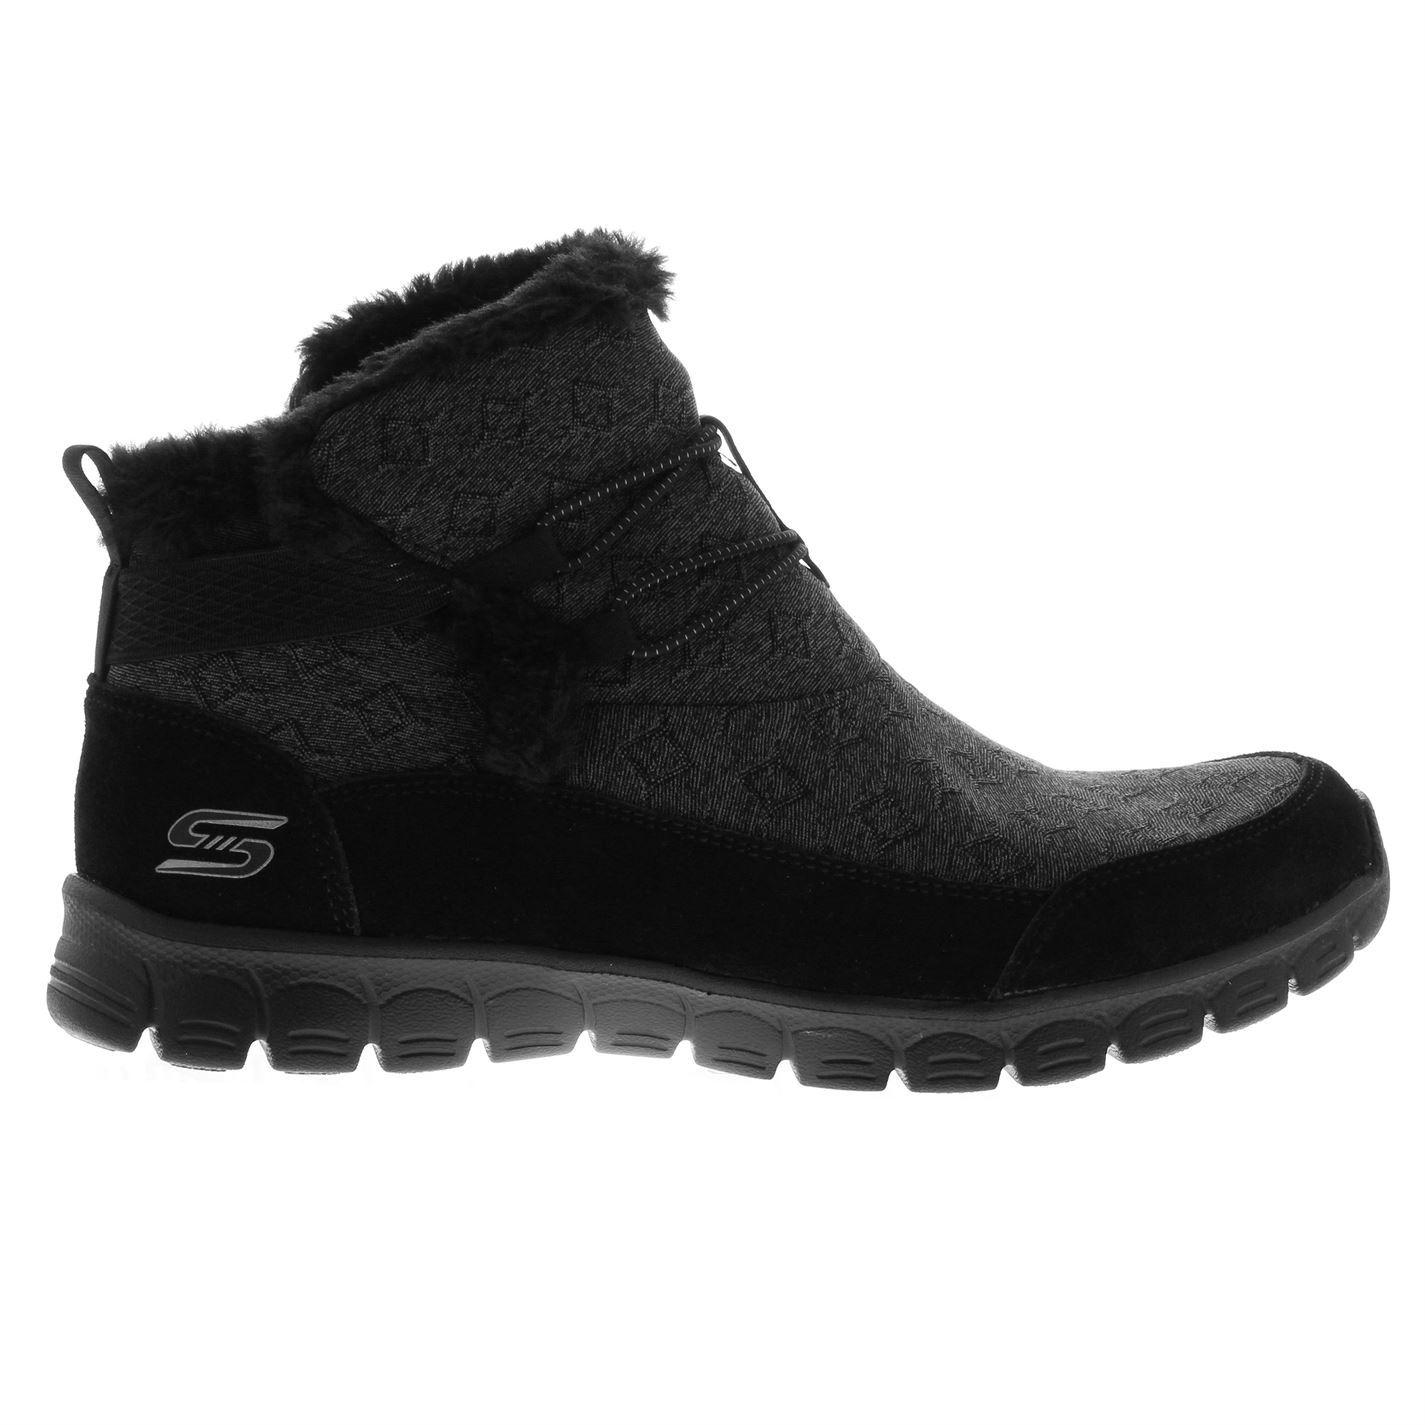 skechers womens boots. skechers-womens-ez-flex-boots-chukka-slip-on- skechers womens boots n